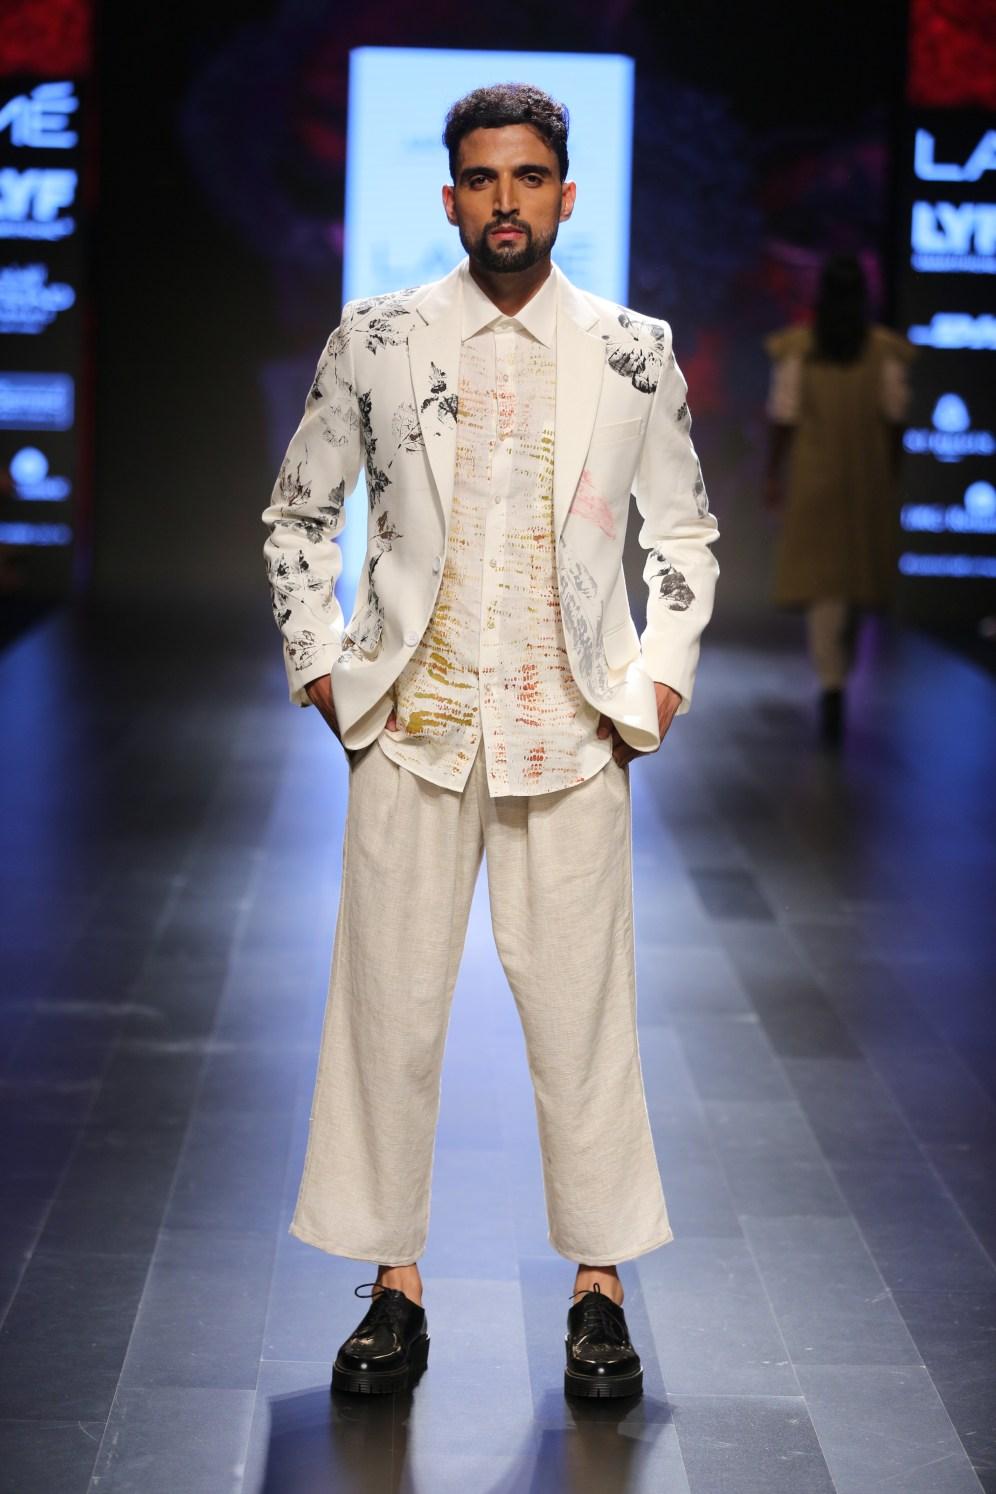 05.Model walking for Designer Aartivijay Gupta @Lakme Fashion Week Winter-Festive 2016